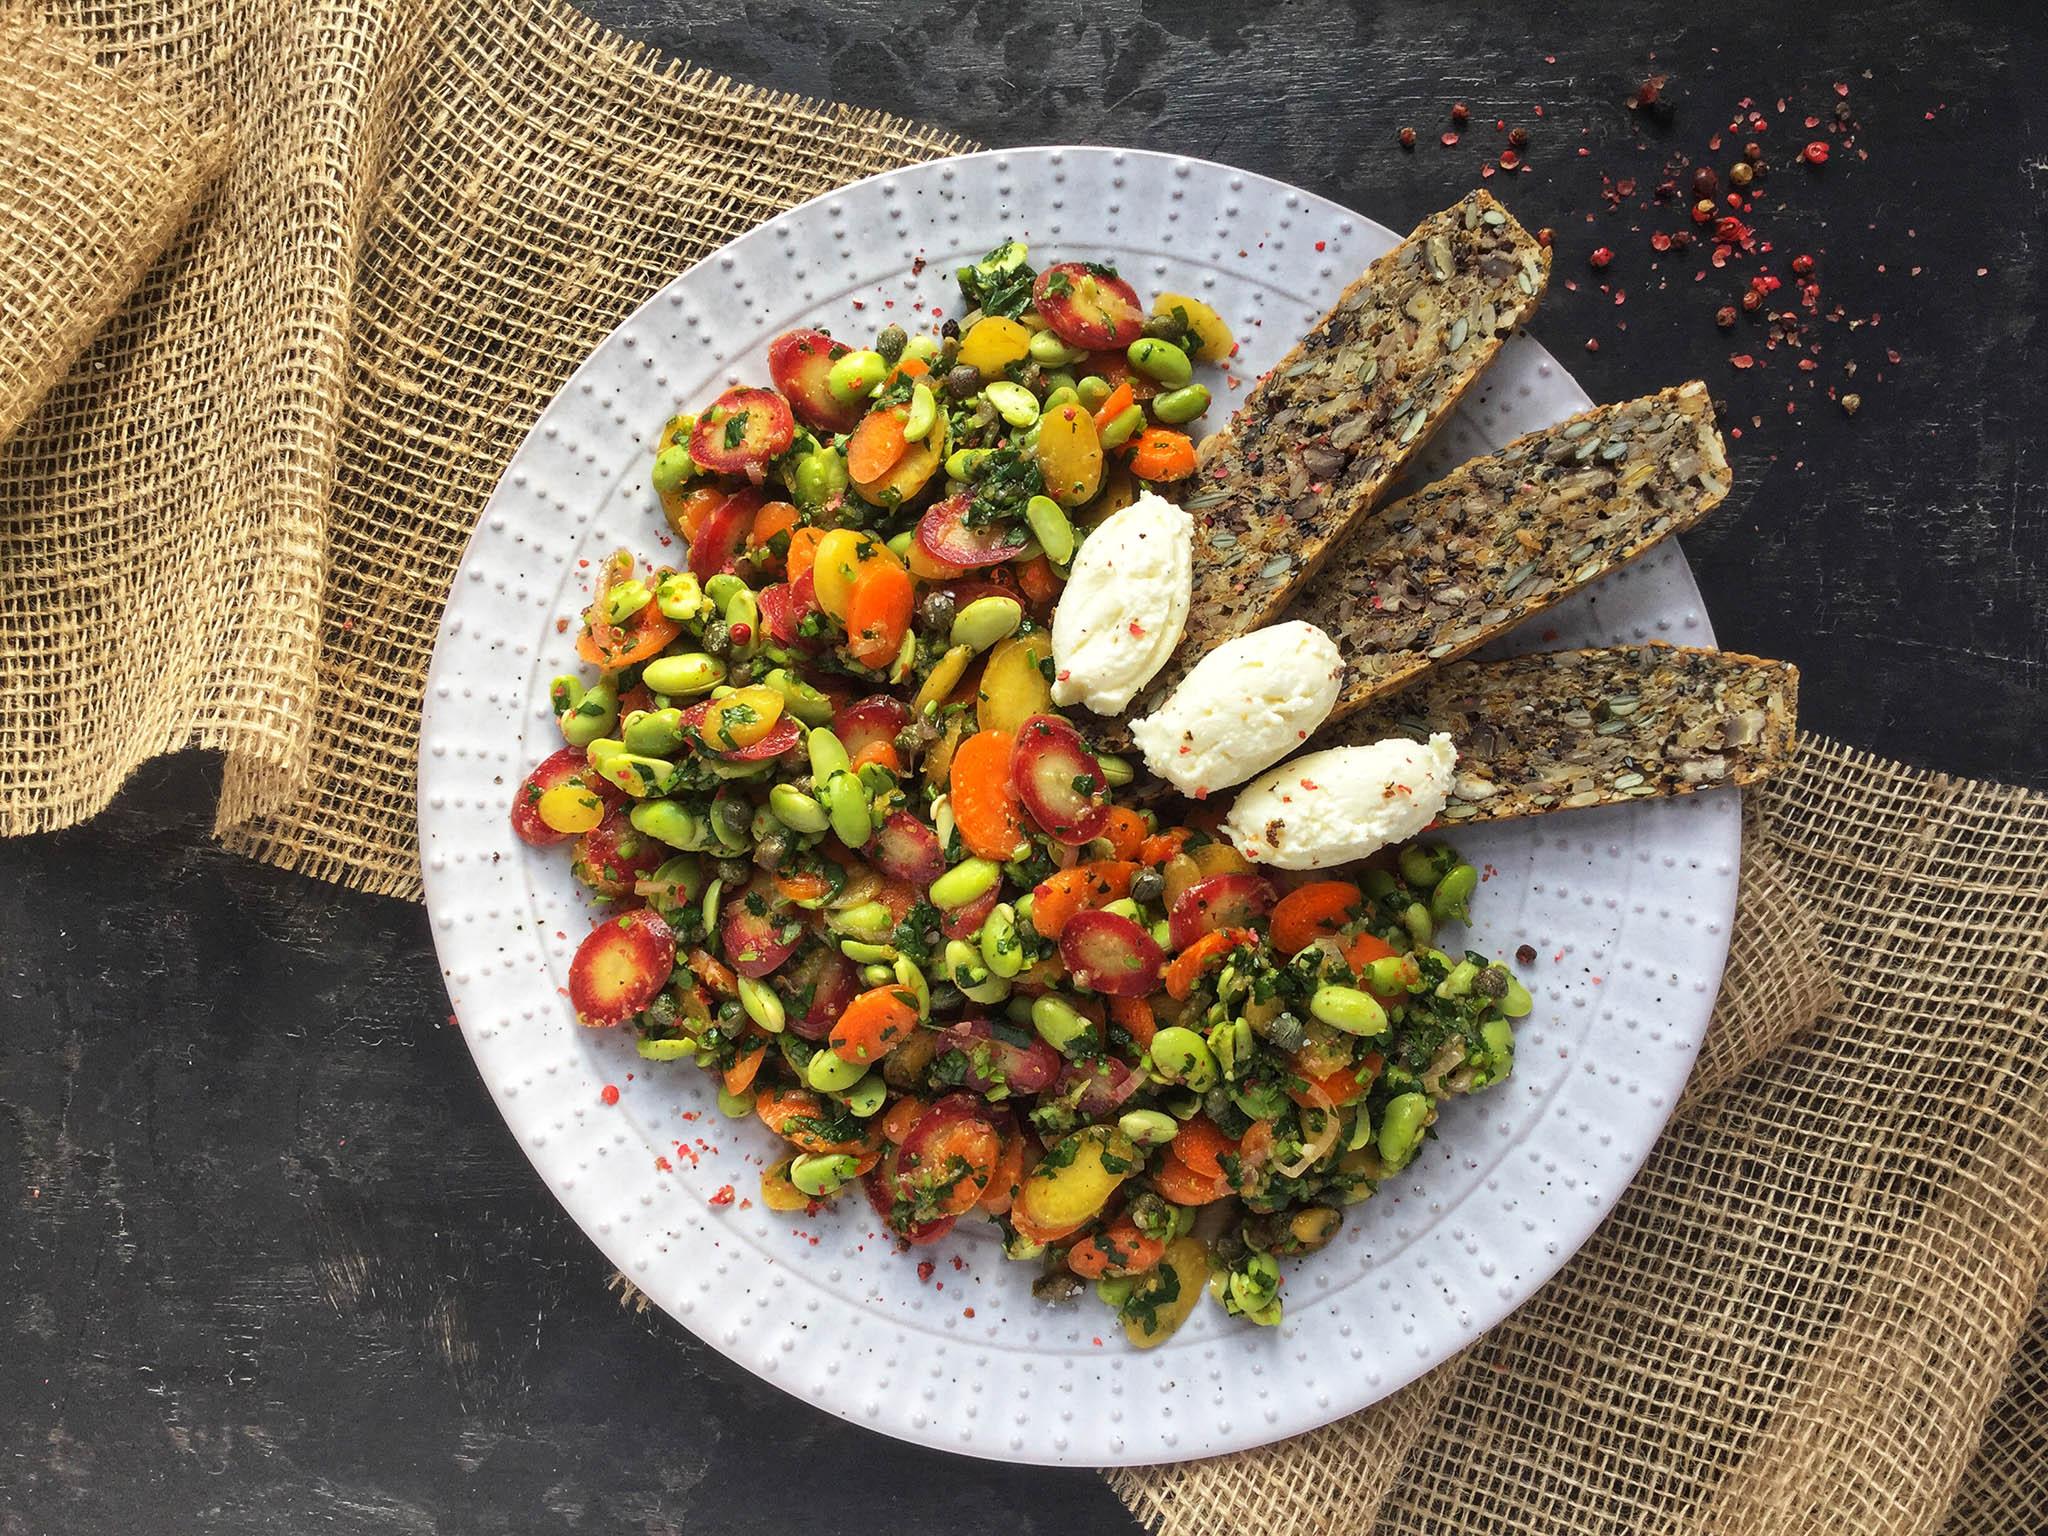 How to make carrot and edamame bean salad 1